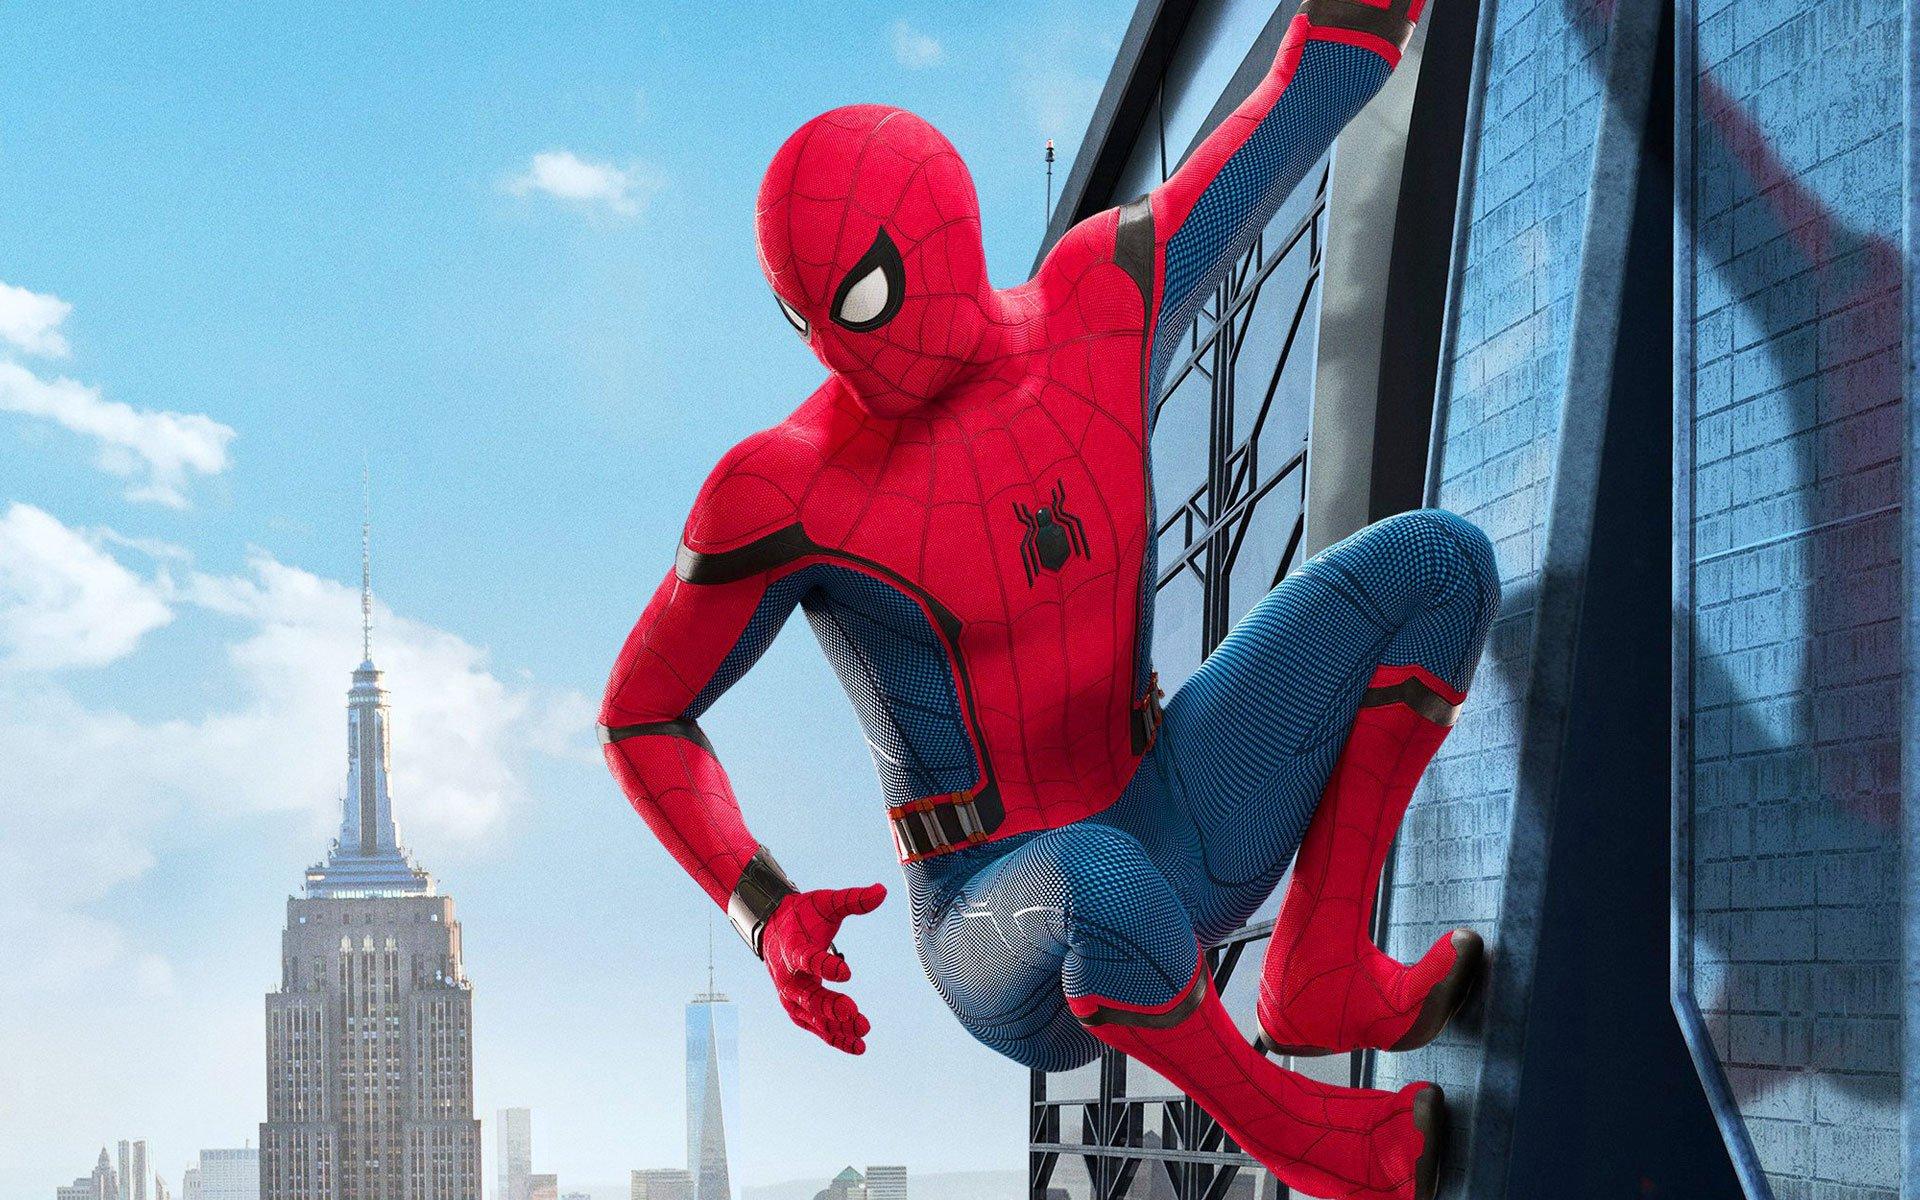 Spider Man Homecoming 2017 Movie Desktop Wallpapers Hd